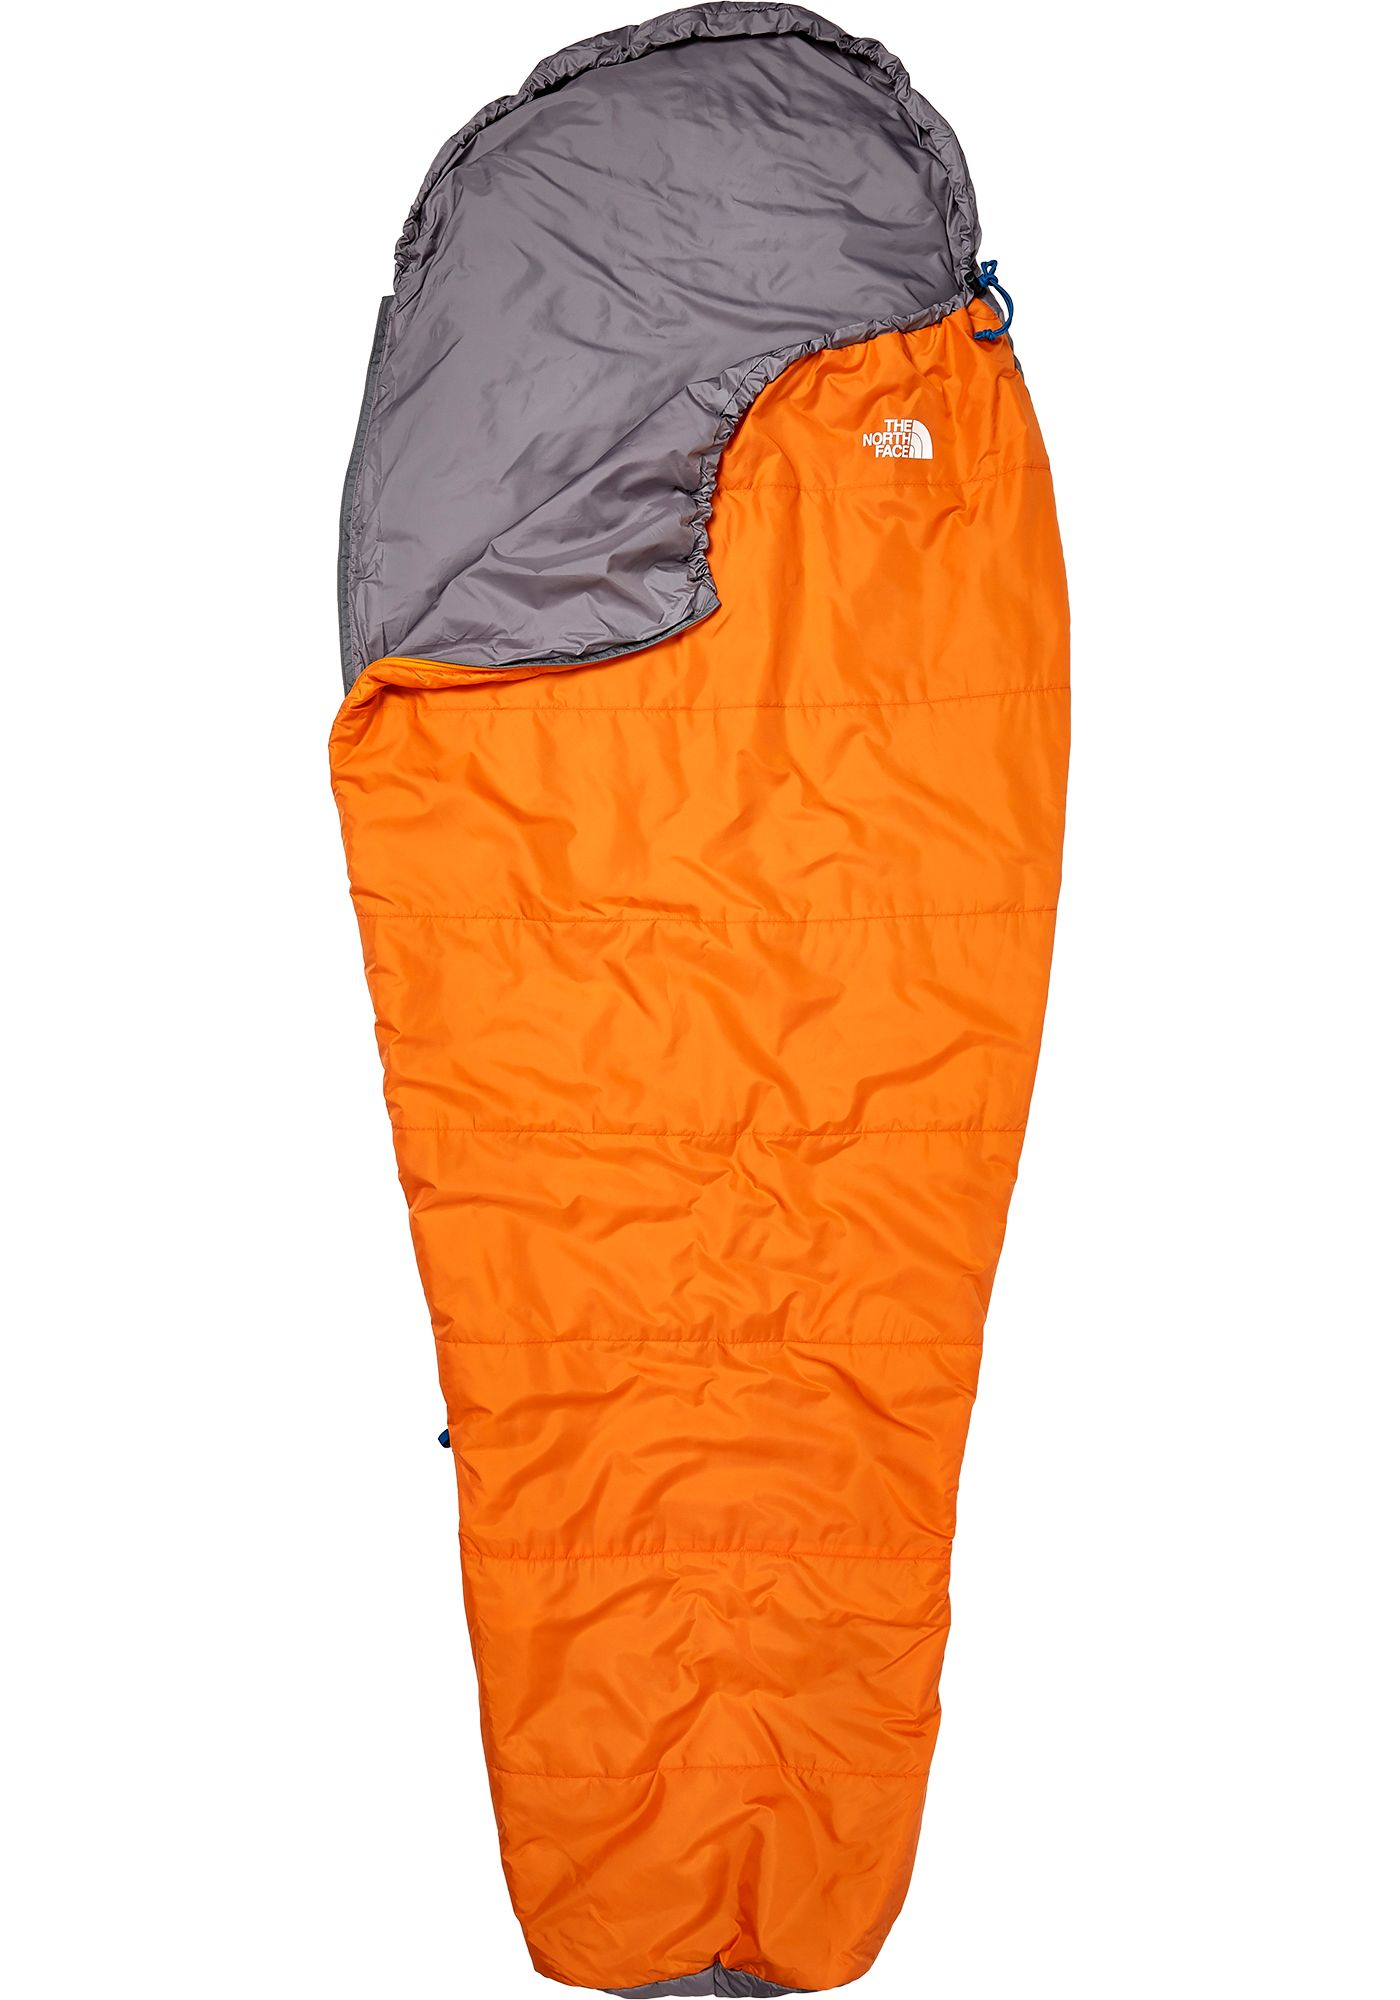 The North Face Wasatch 55° Sleeping Bag - Prior Season